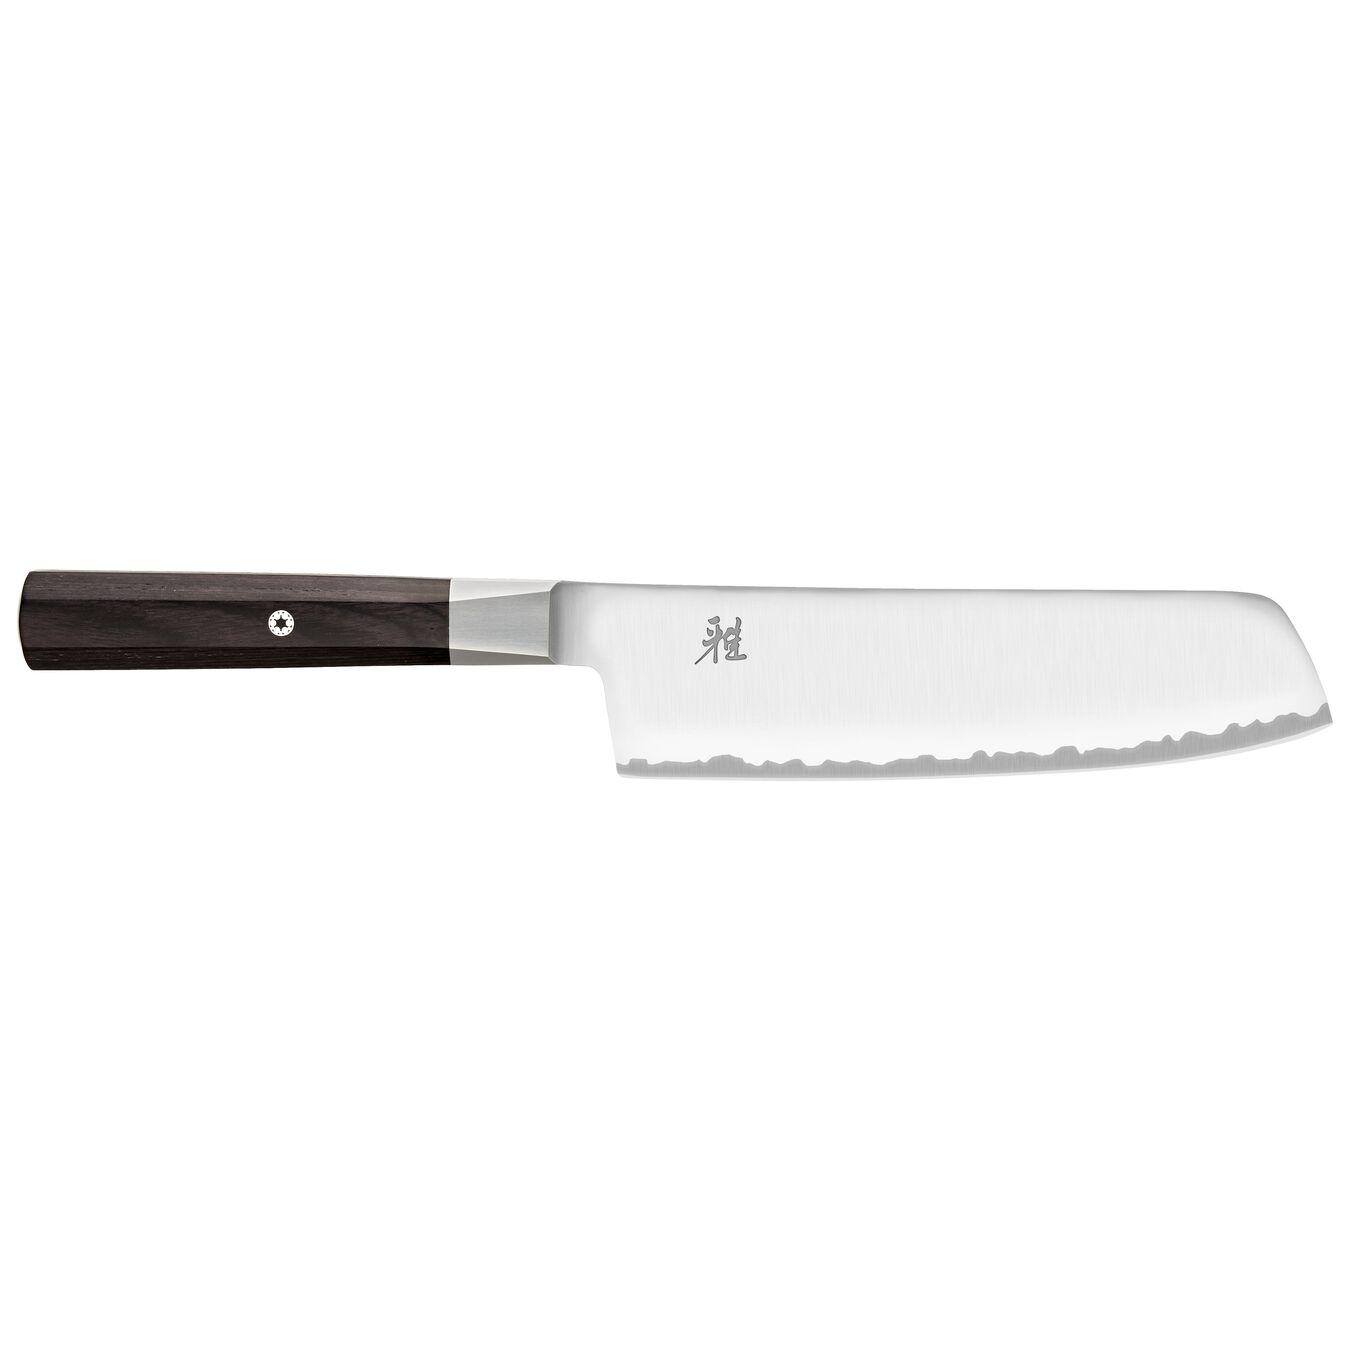 6.5-inch, Nakiri Knife,,large 2